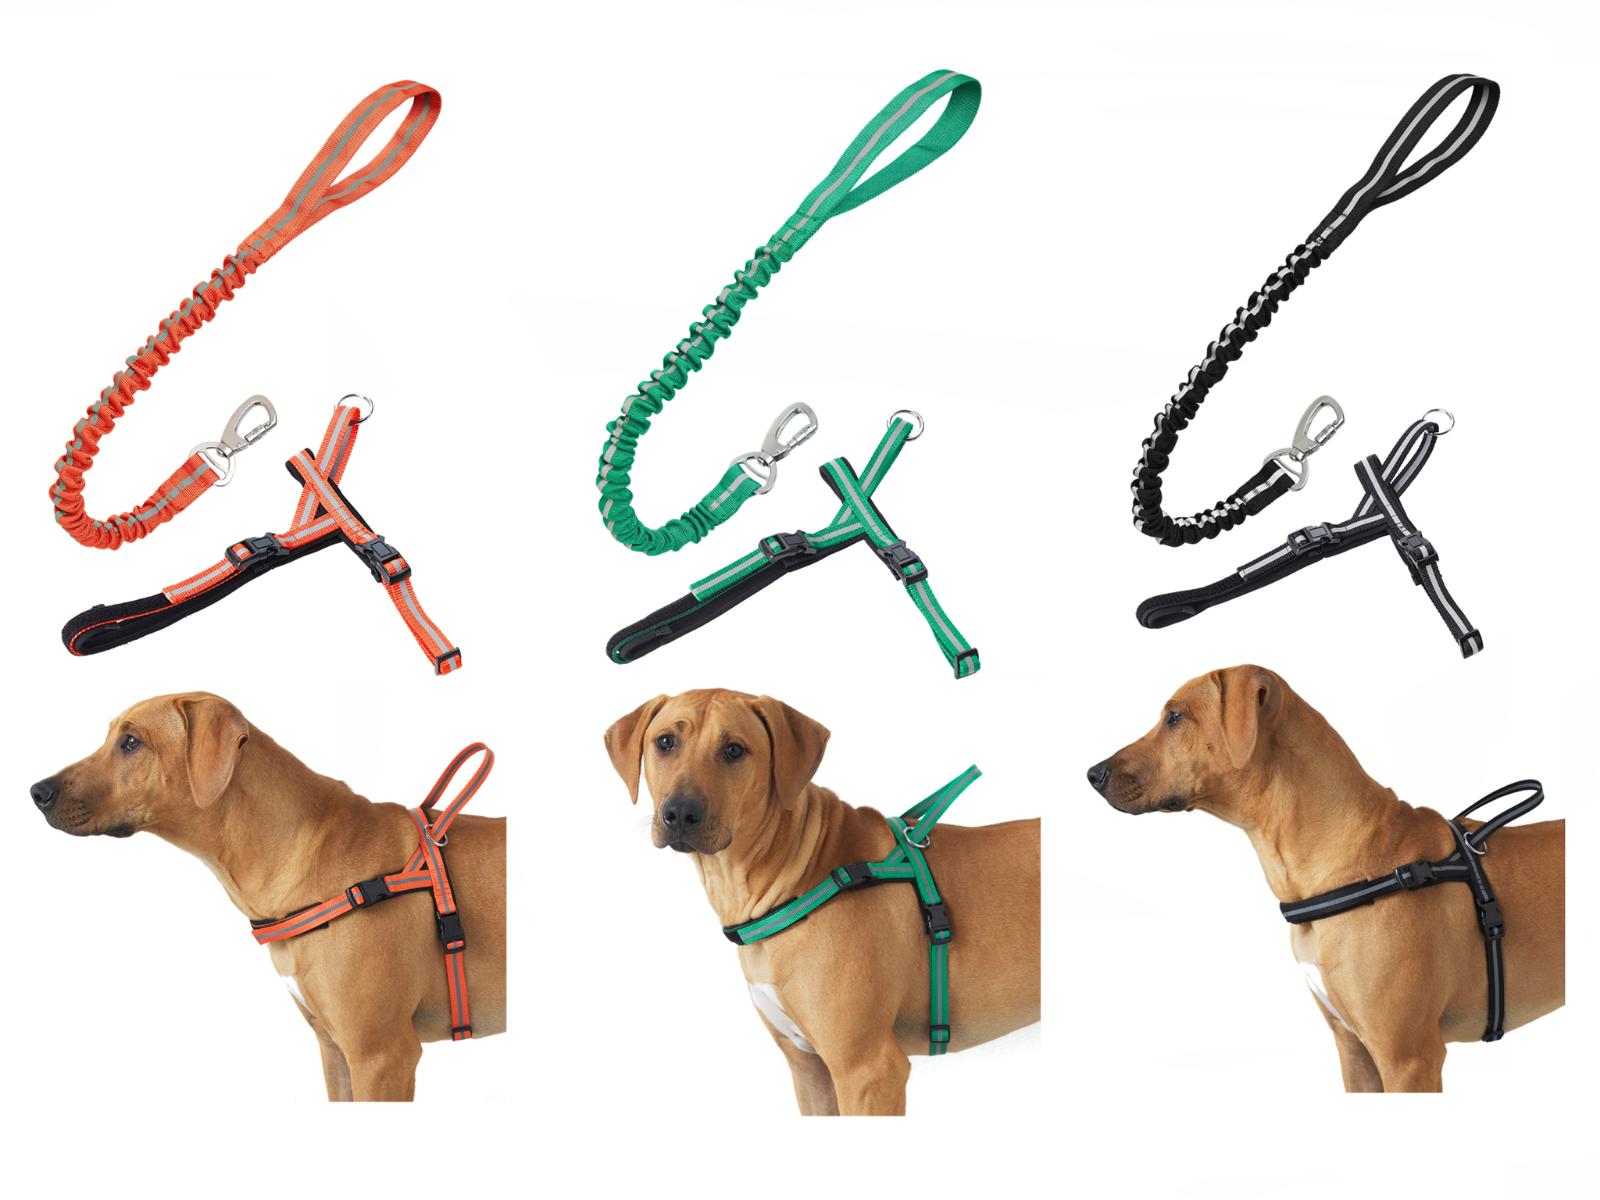 Anti-Shock Elastic Leash & Comfort Reflective Harness for Medium & Large Dogs